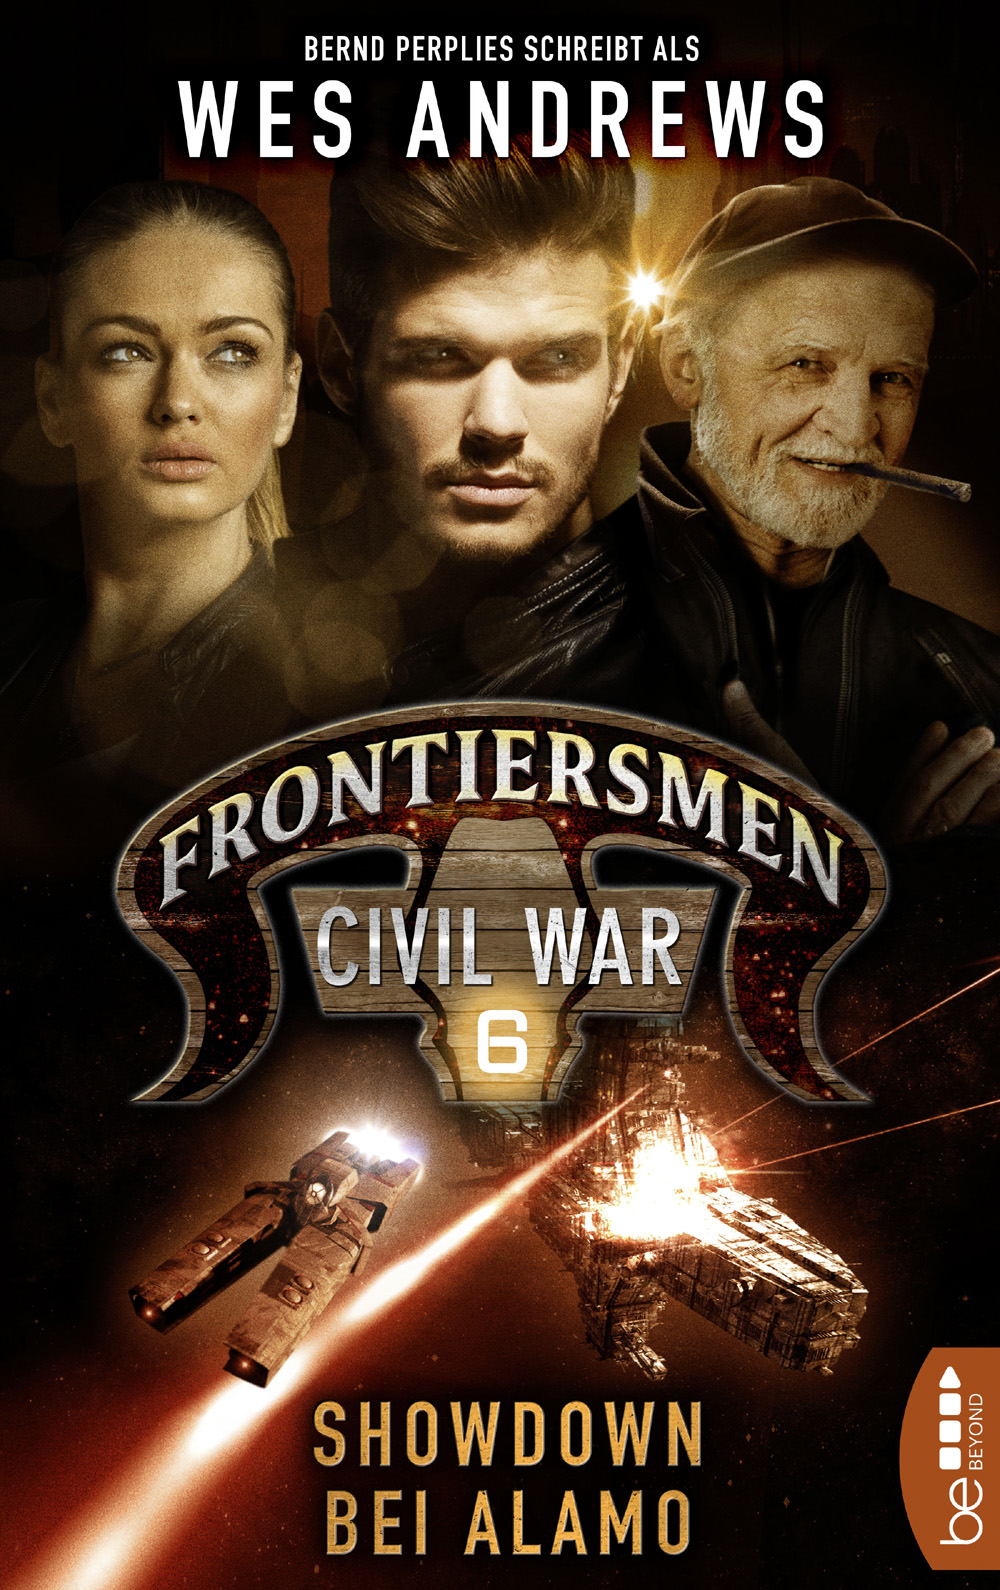 Frontiersmen-Civil-War-6-Showdown-bei-Alamo_Wes-Andrews.jpg